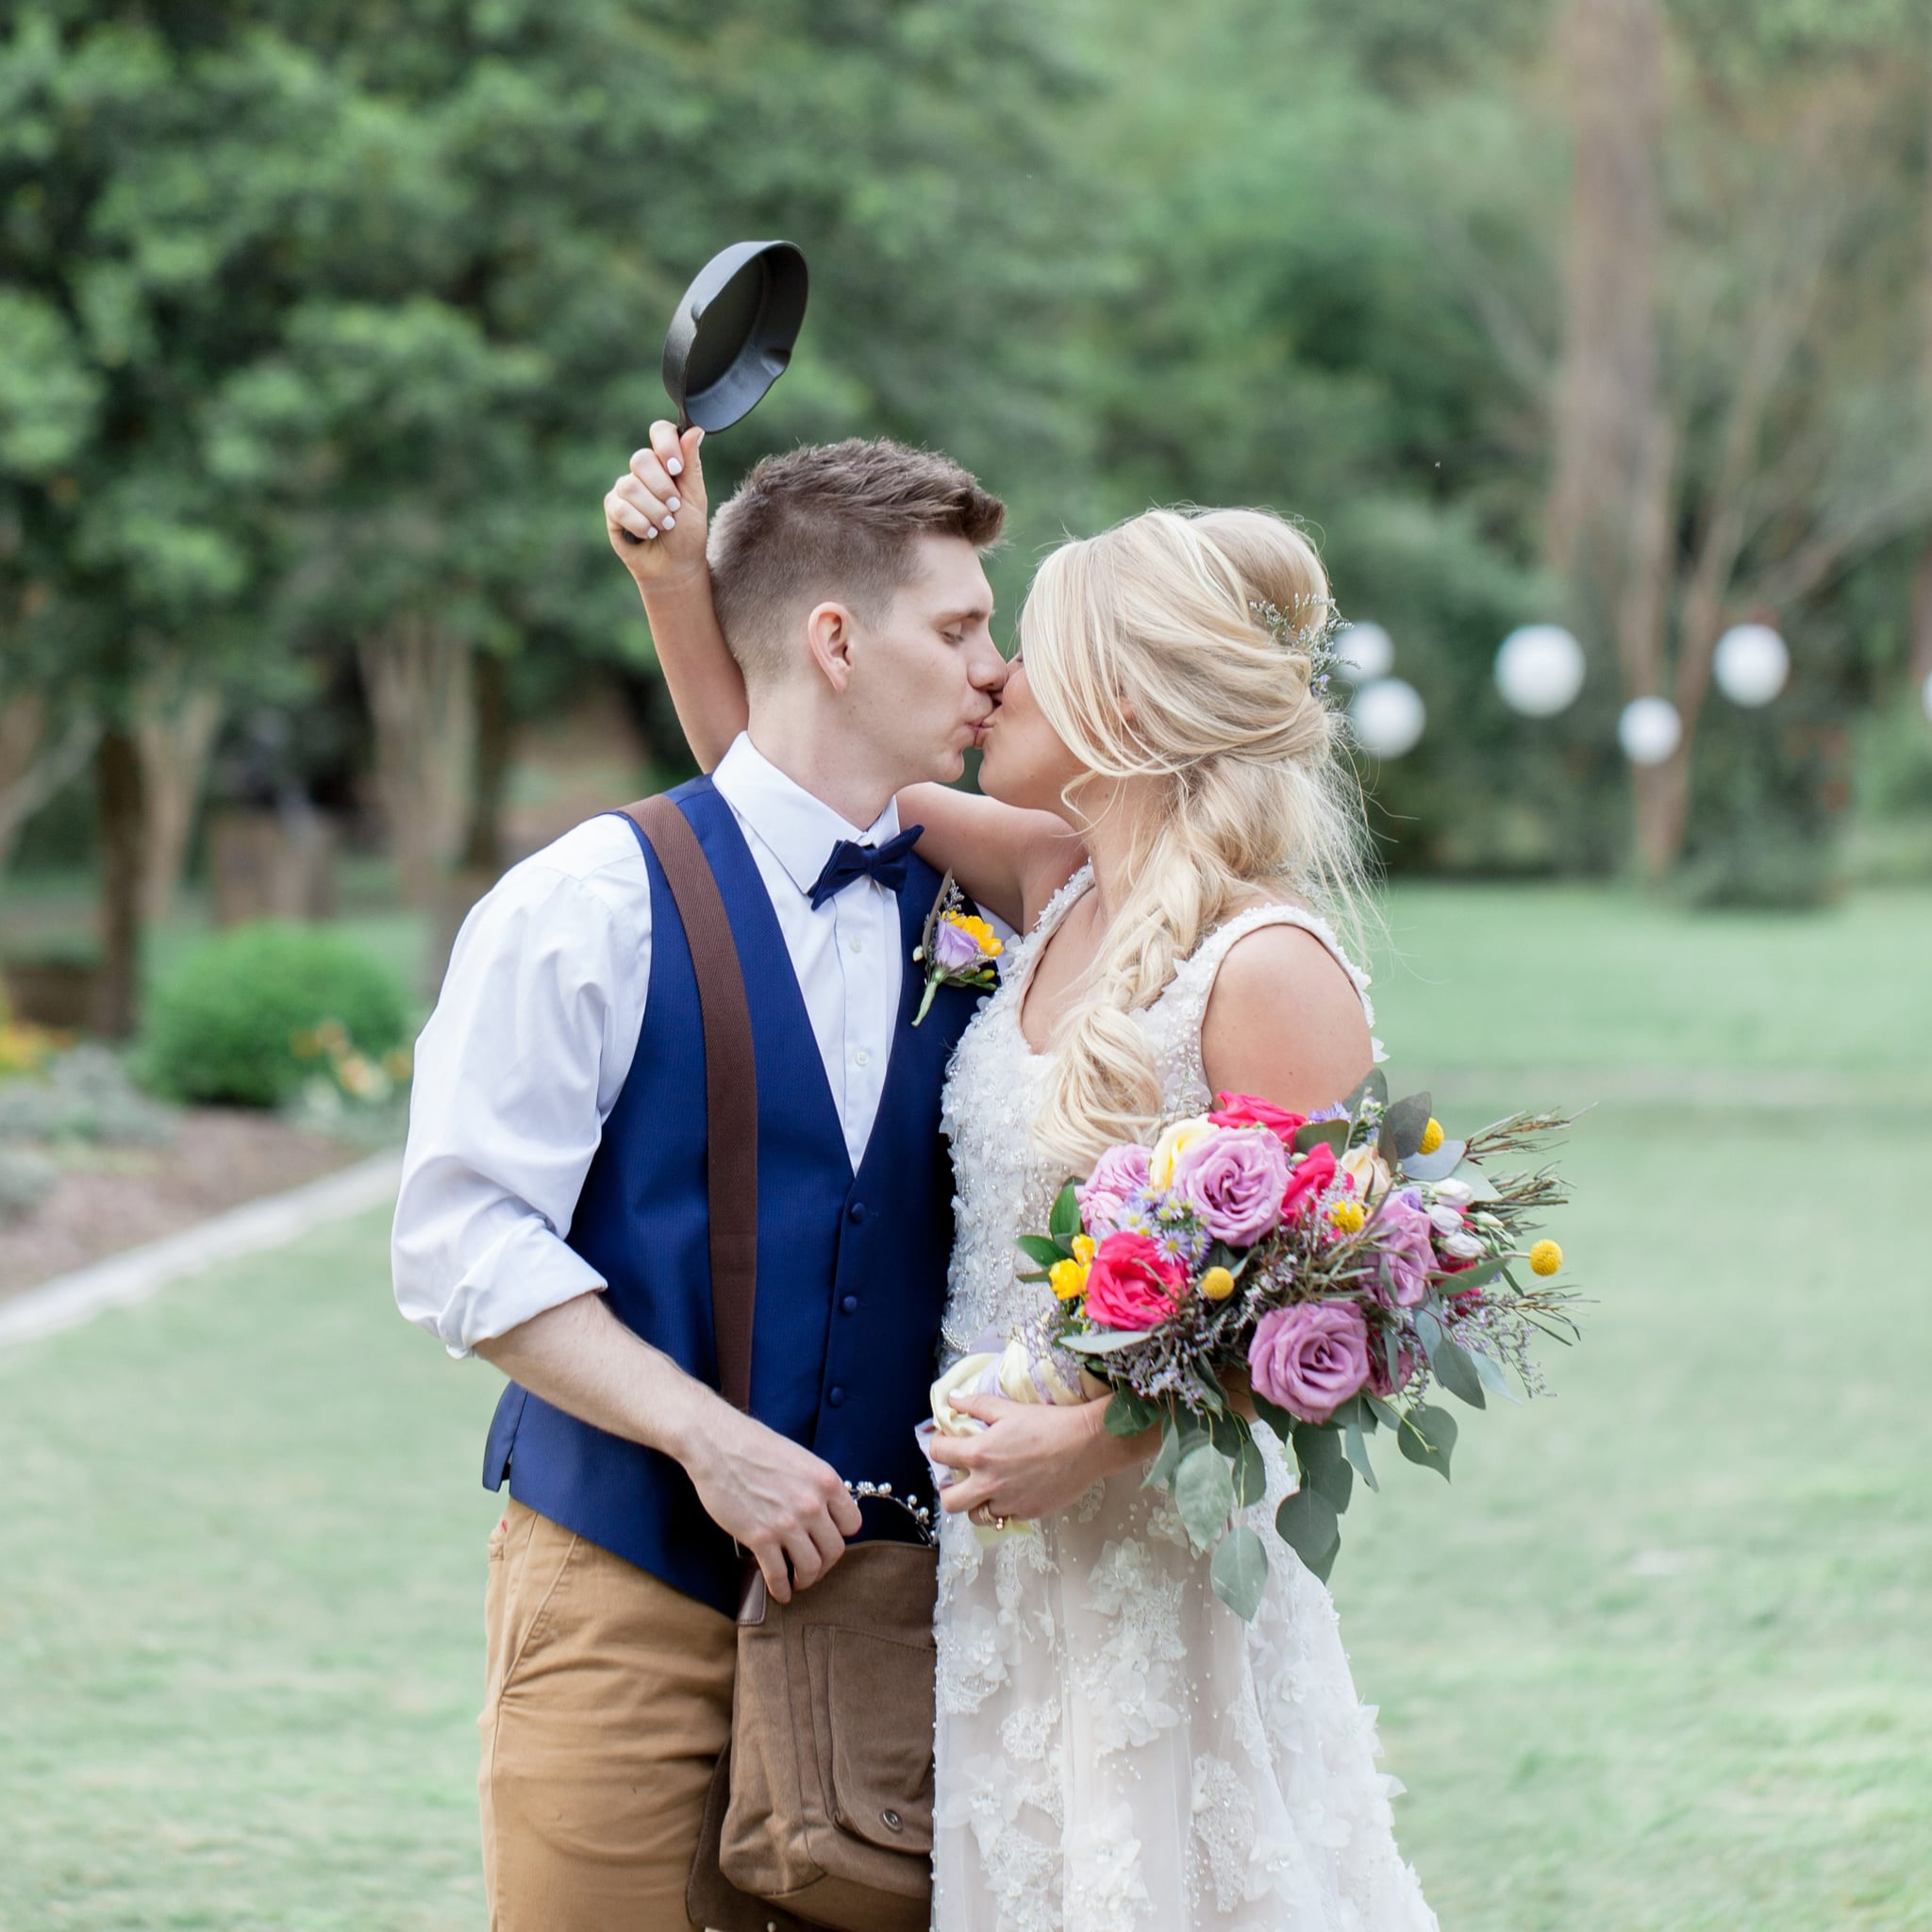 Disney's Tangled Movie Wedding Ideas   POPSUGAR Love & Sex